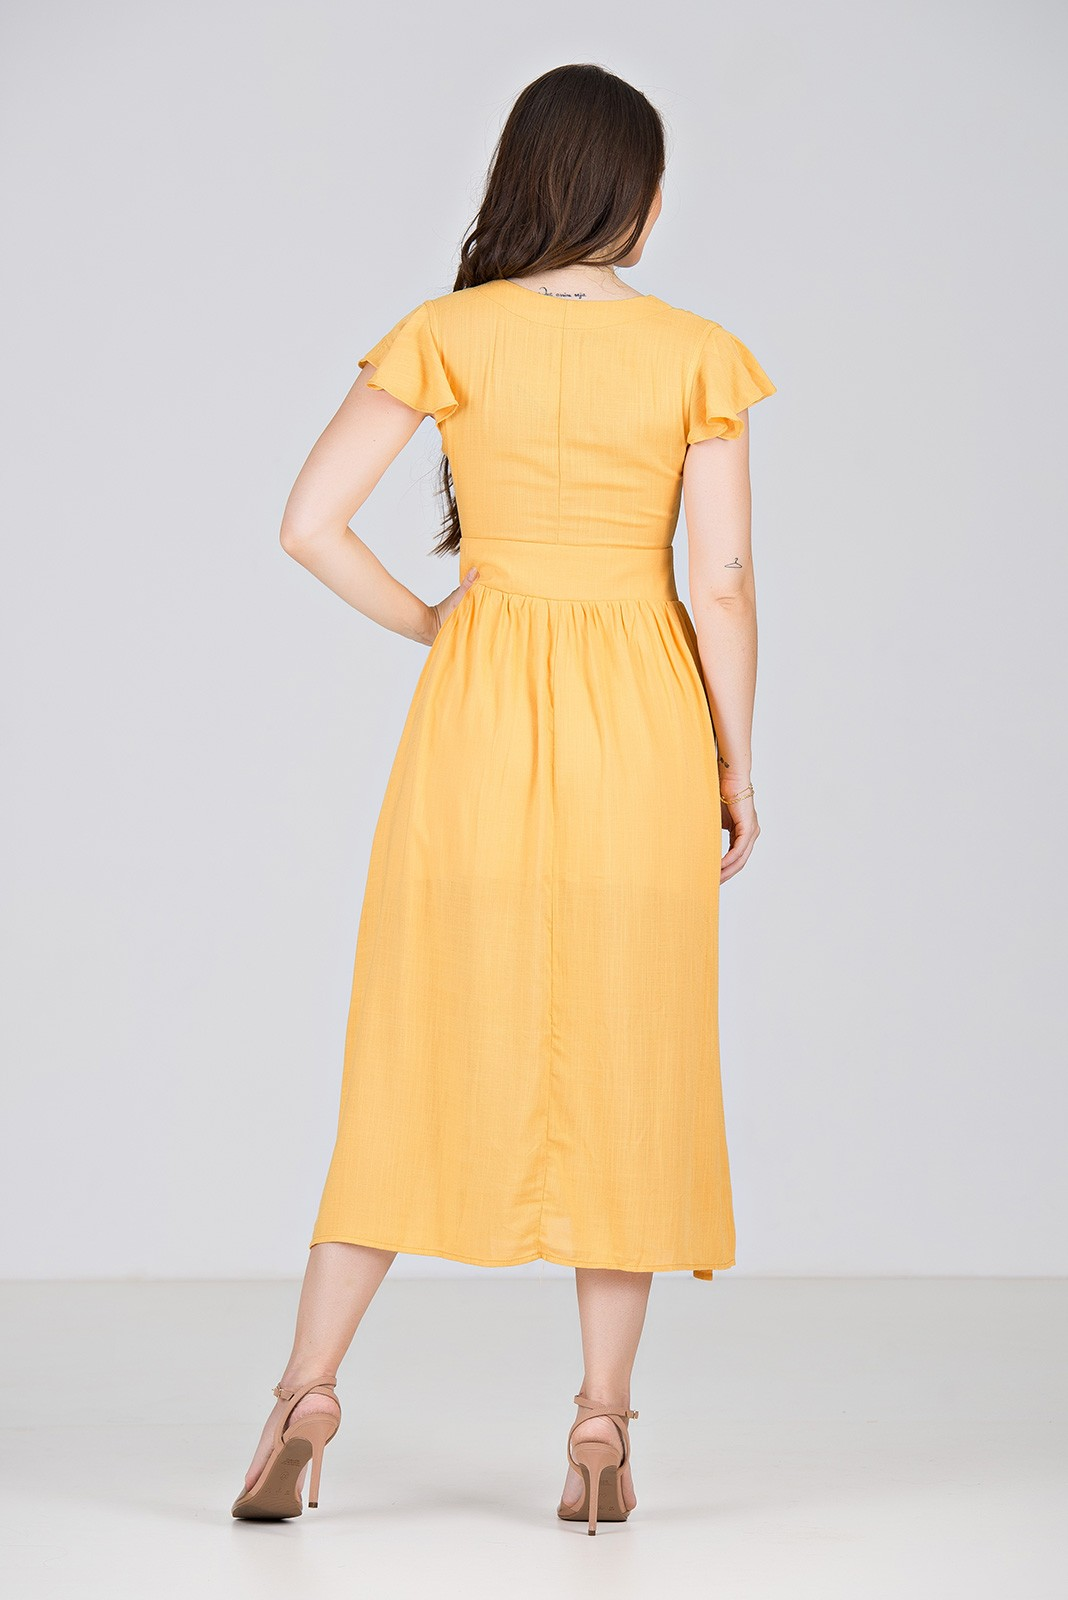 Vestido Midi em Viscose Amarela - Midsize